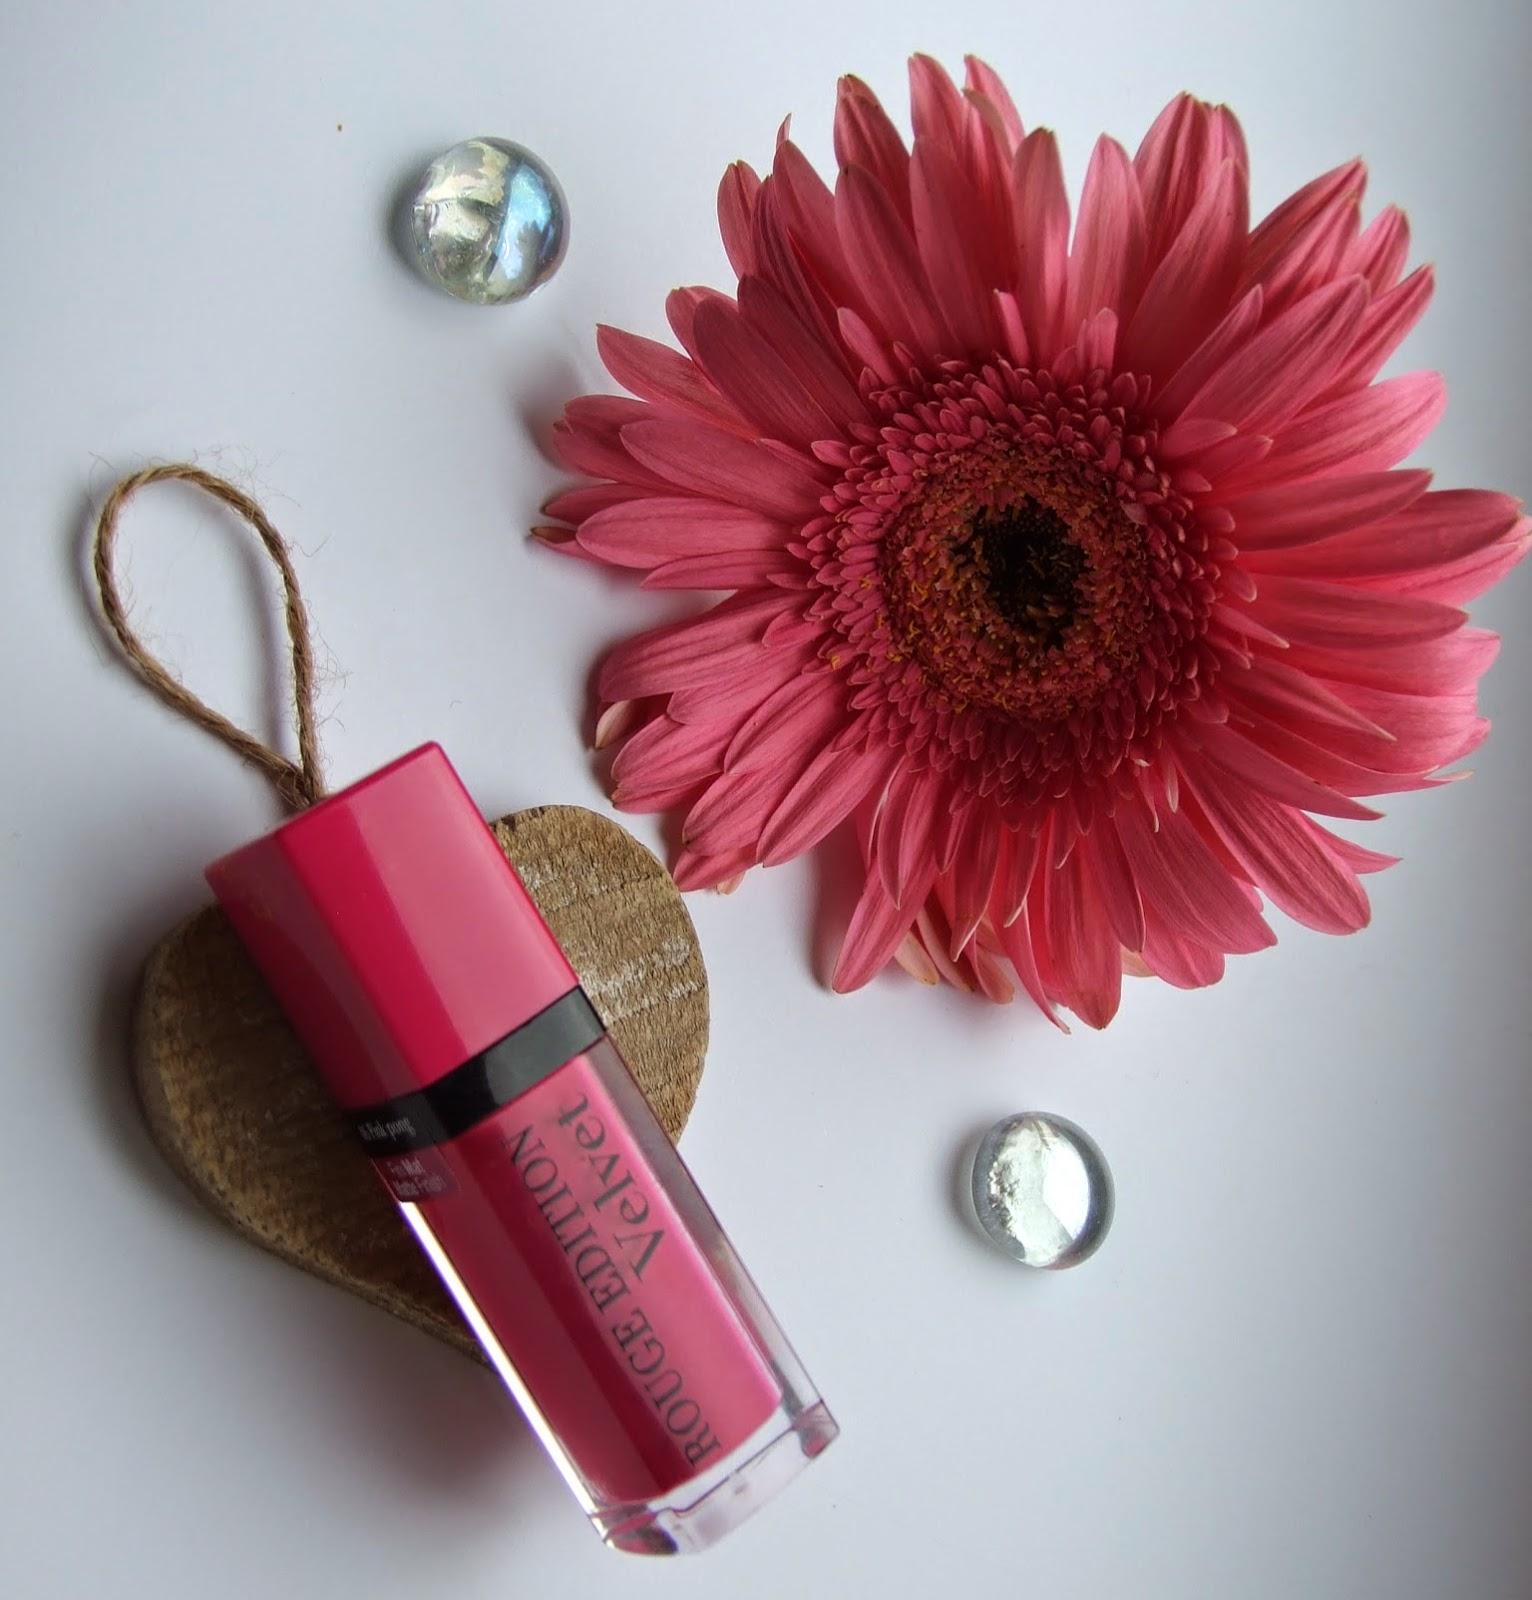 Bourjois Rouge Edition Velvet 06 Pink Pong lipstick stain matte